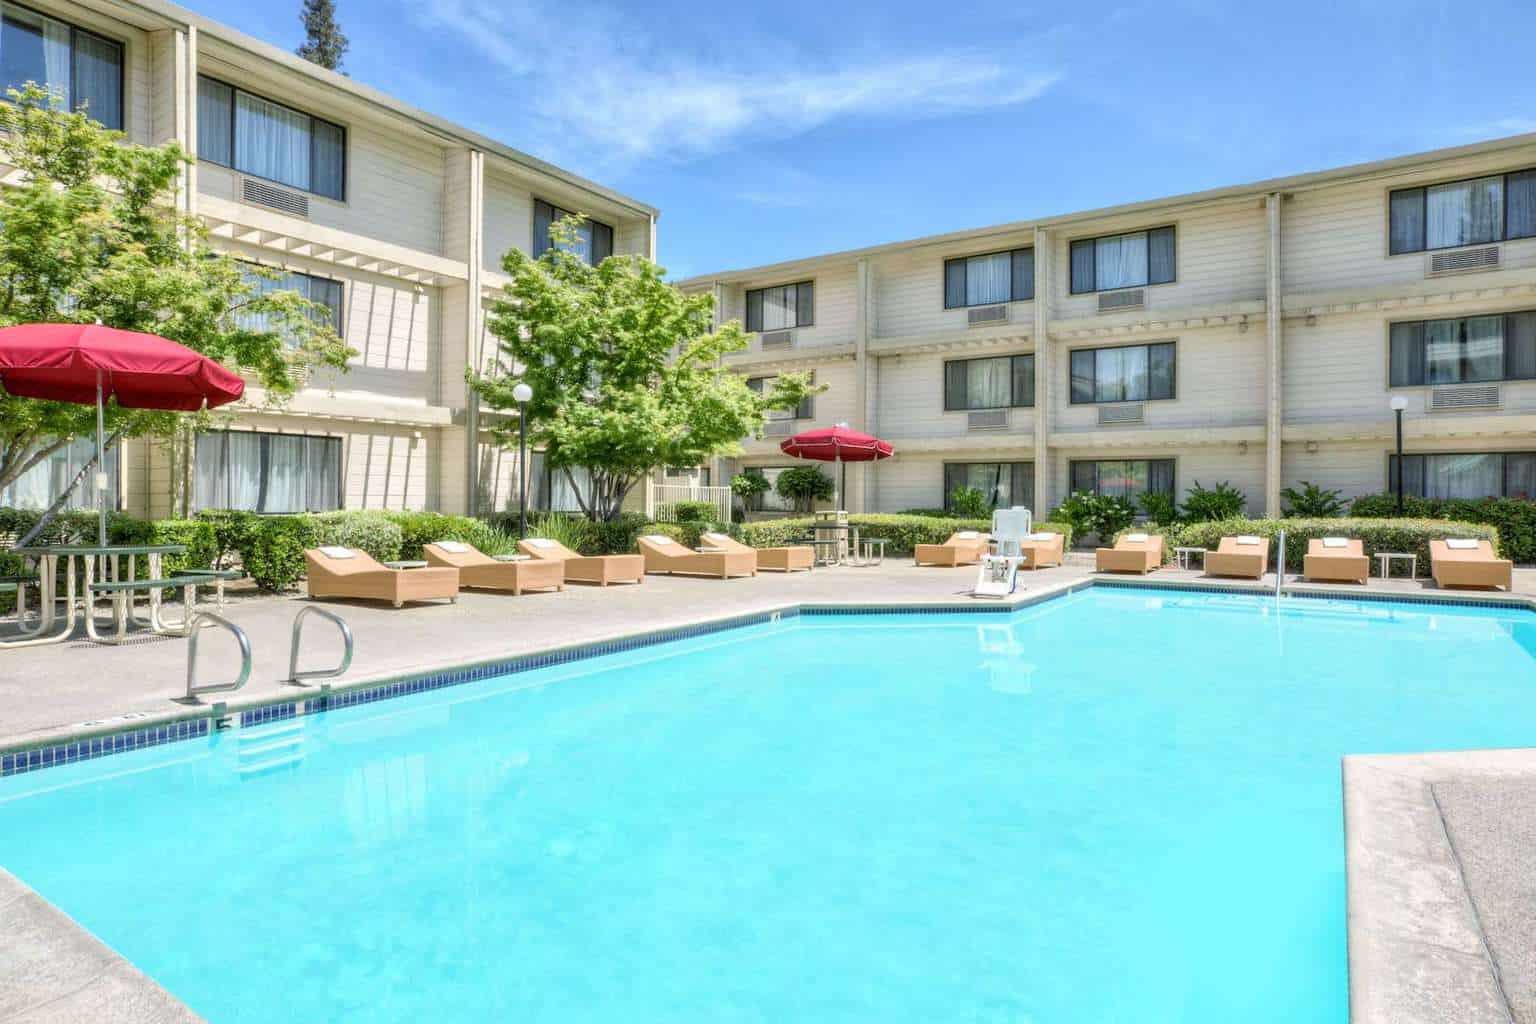 image of Hawthorn Suites Sacramento